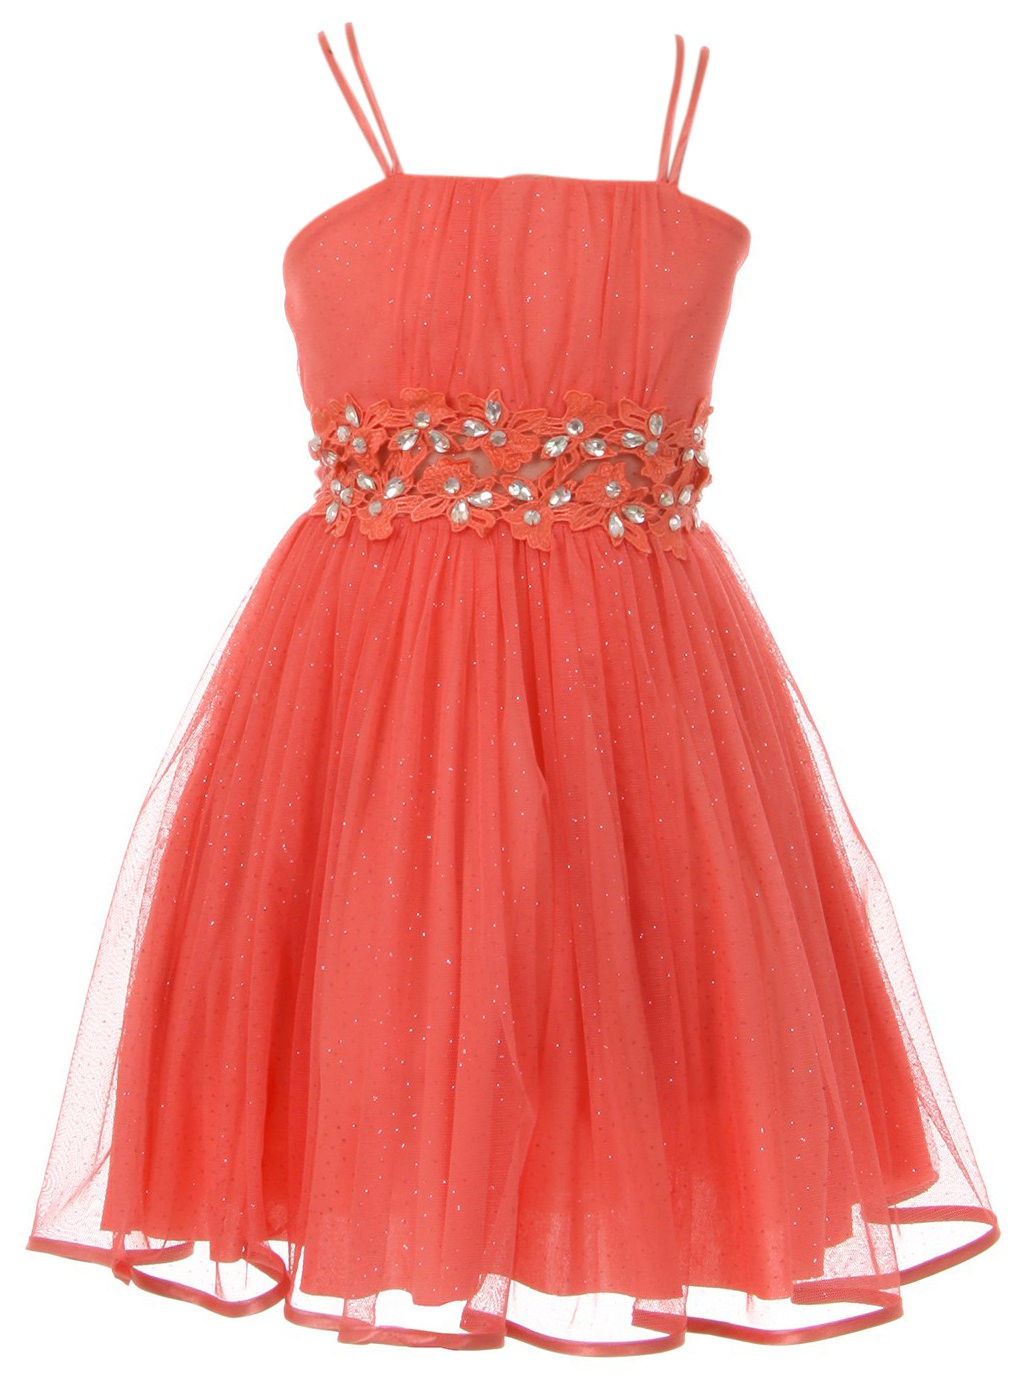 Little Girls Dress Set 2 PCS Jacket Rhinestones Glitter Flower Girl Dress Clothing Set Coral 4 (J21KS44)